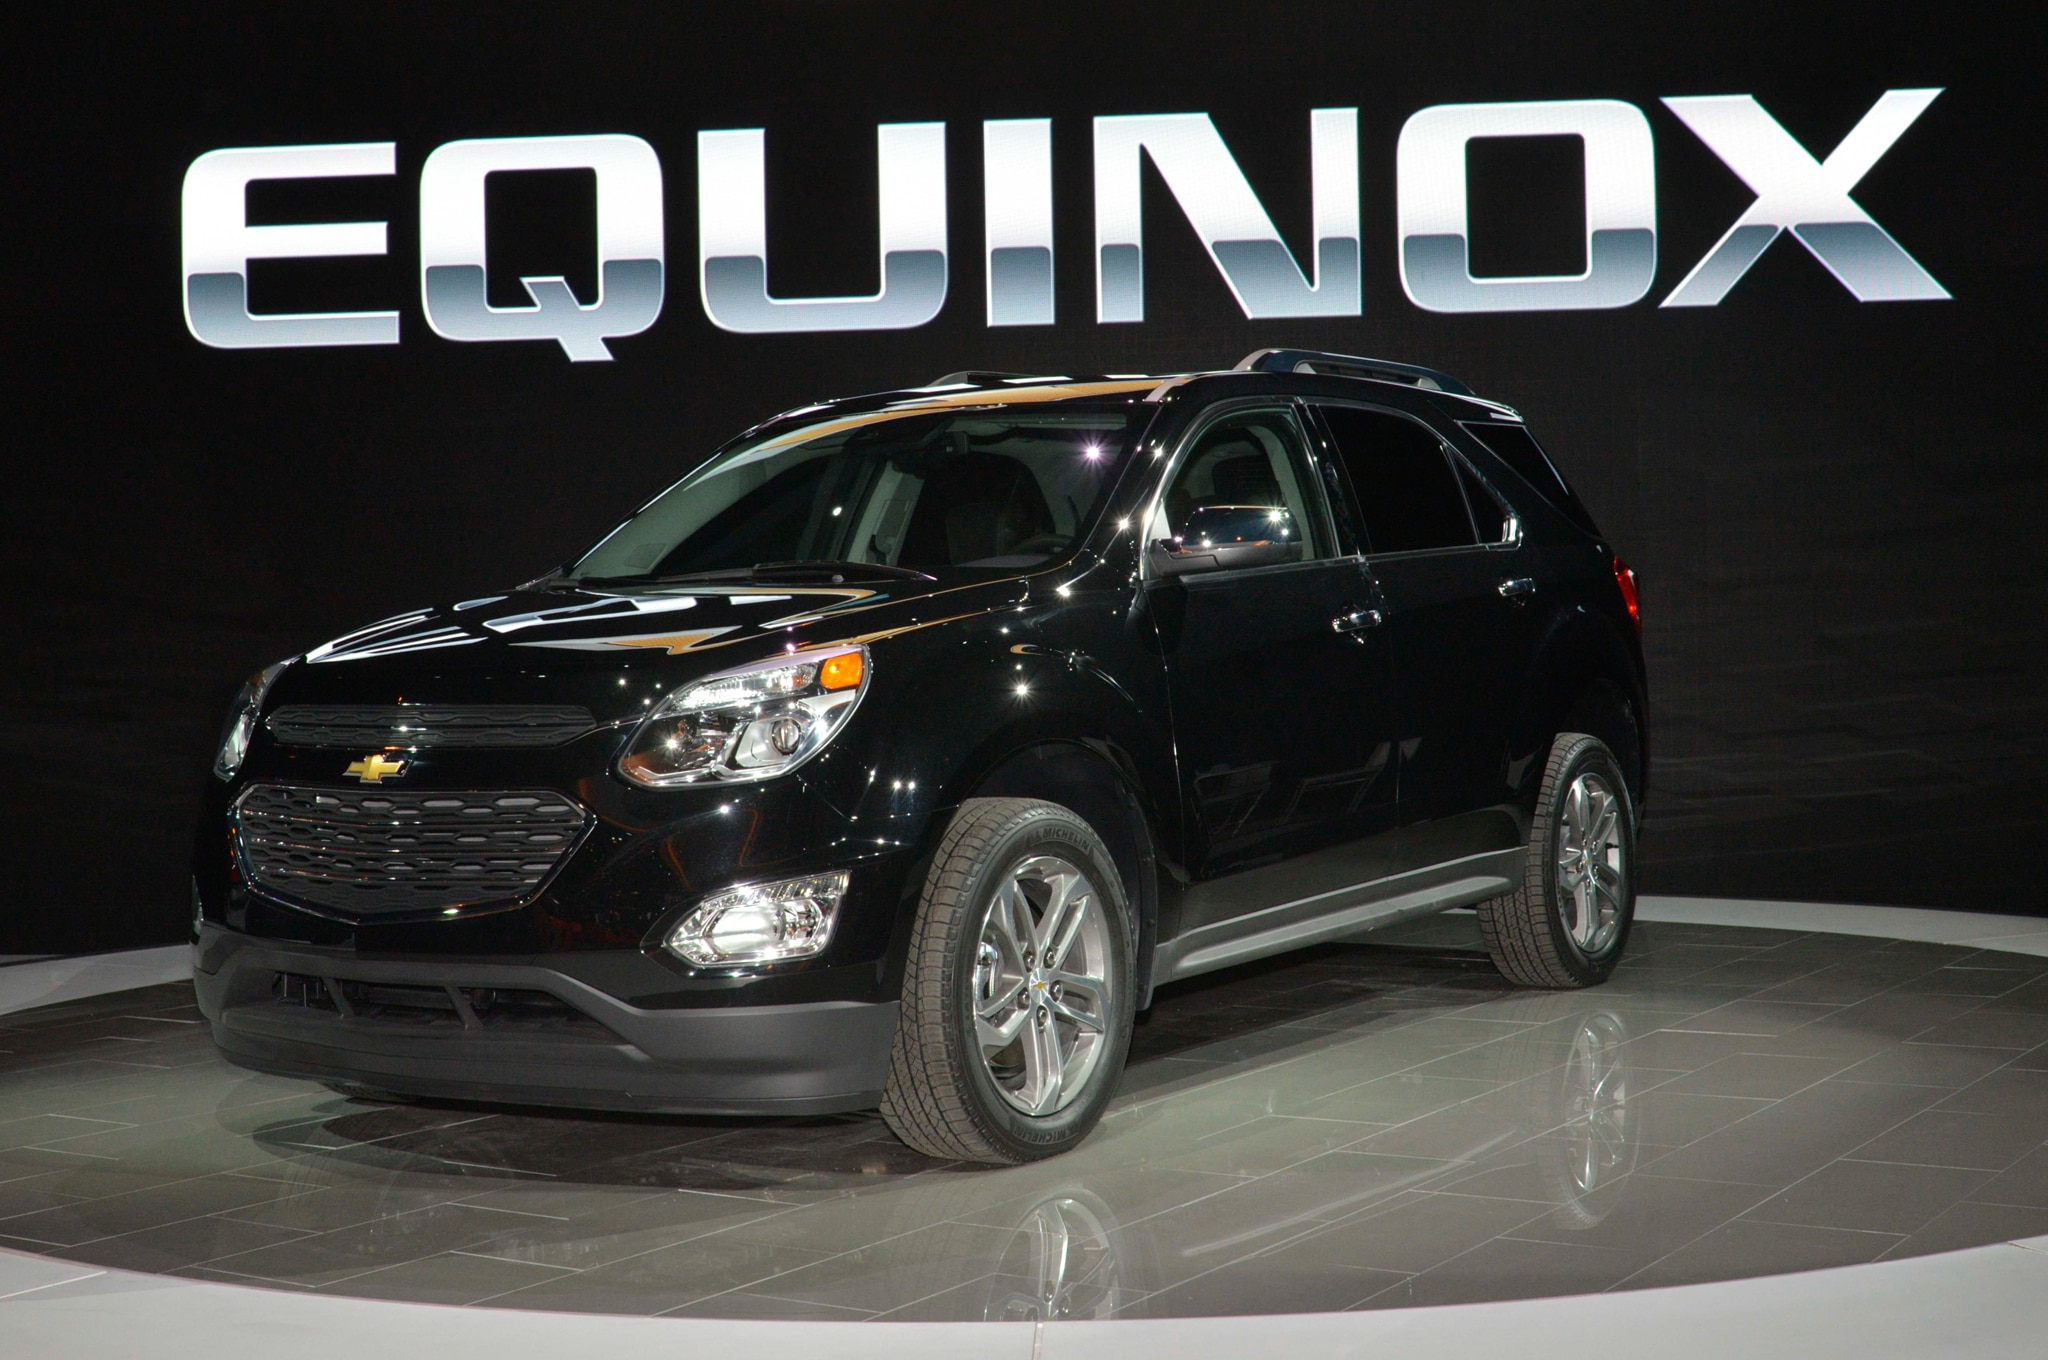 2016 Chevrolet Equinox Front Three Quarter 01